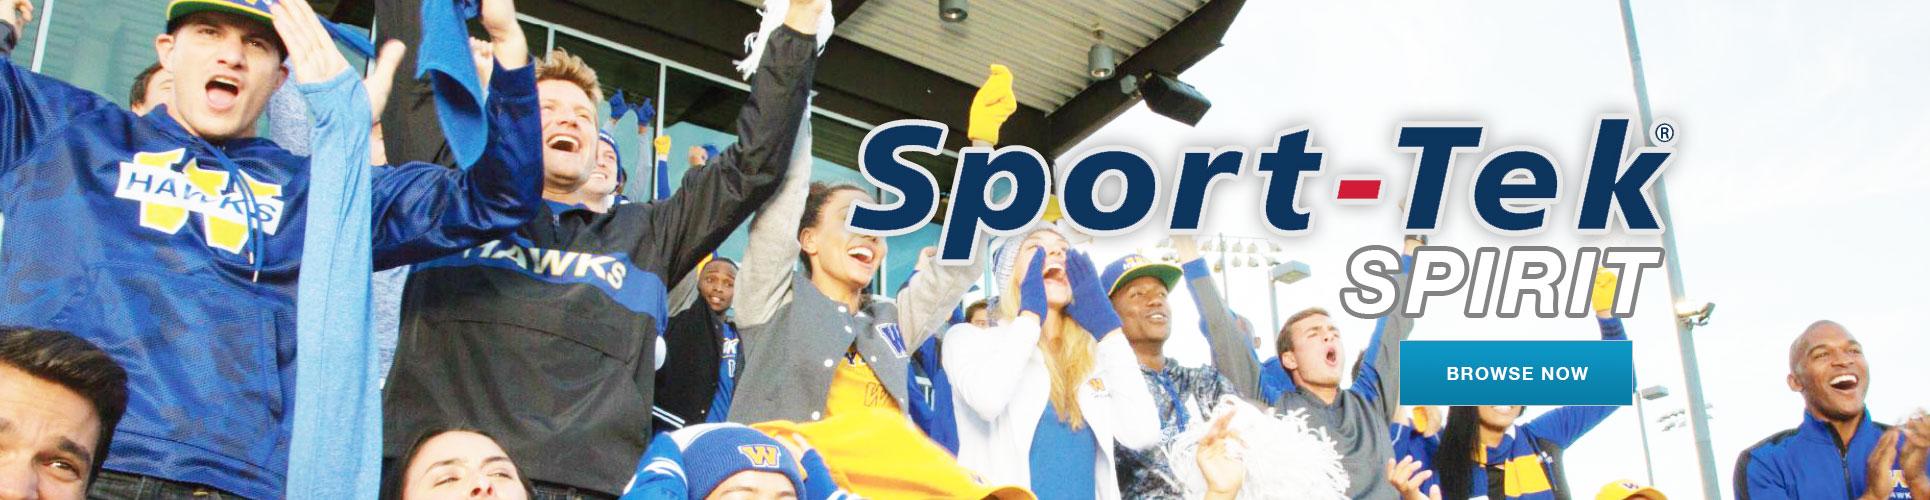 shop-sport-tek-spirit223242.jpg